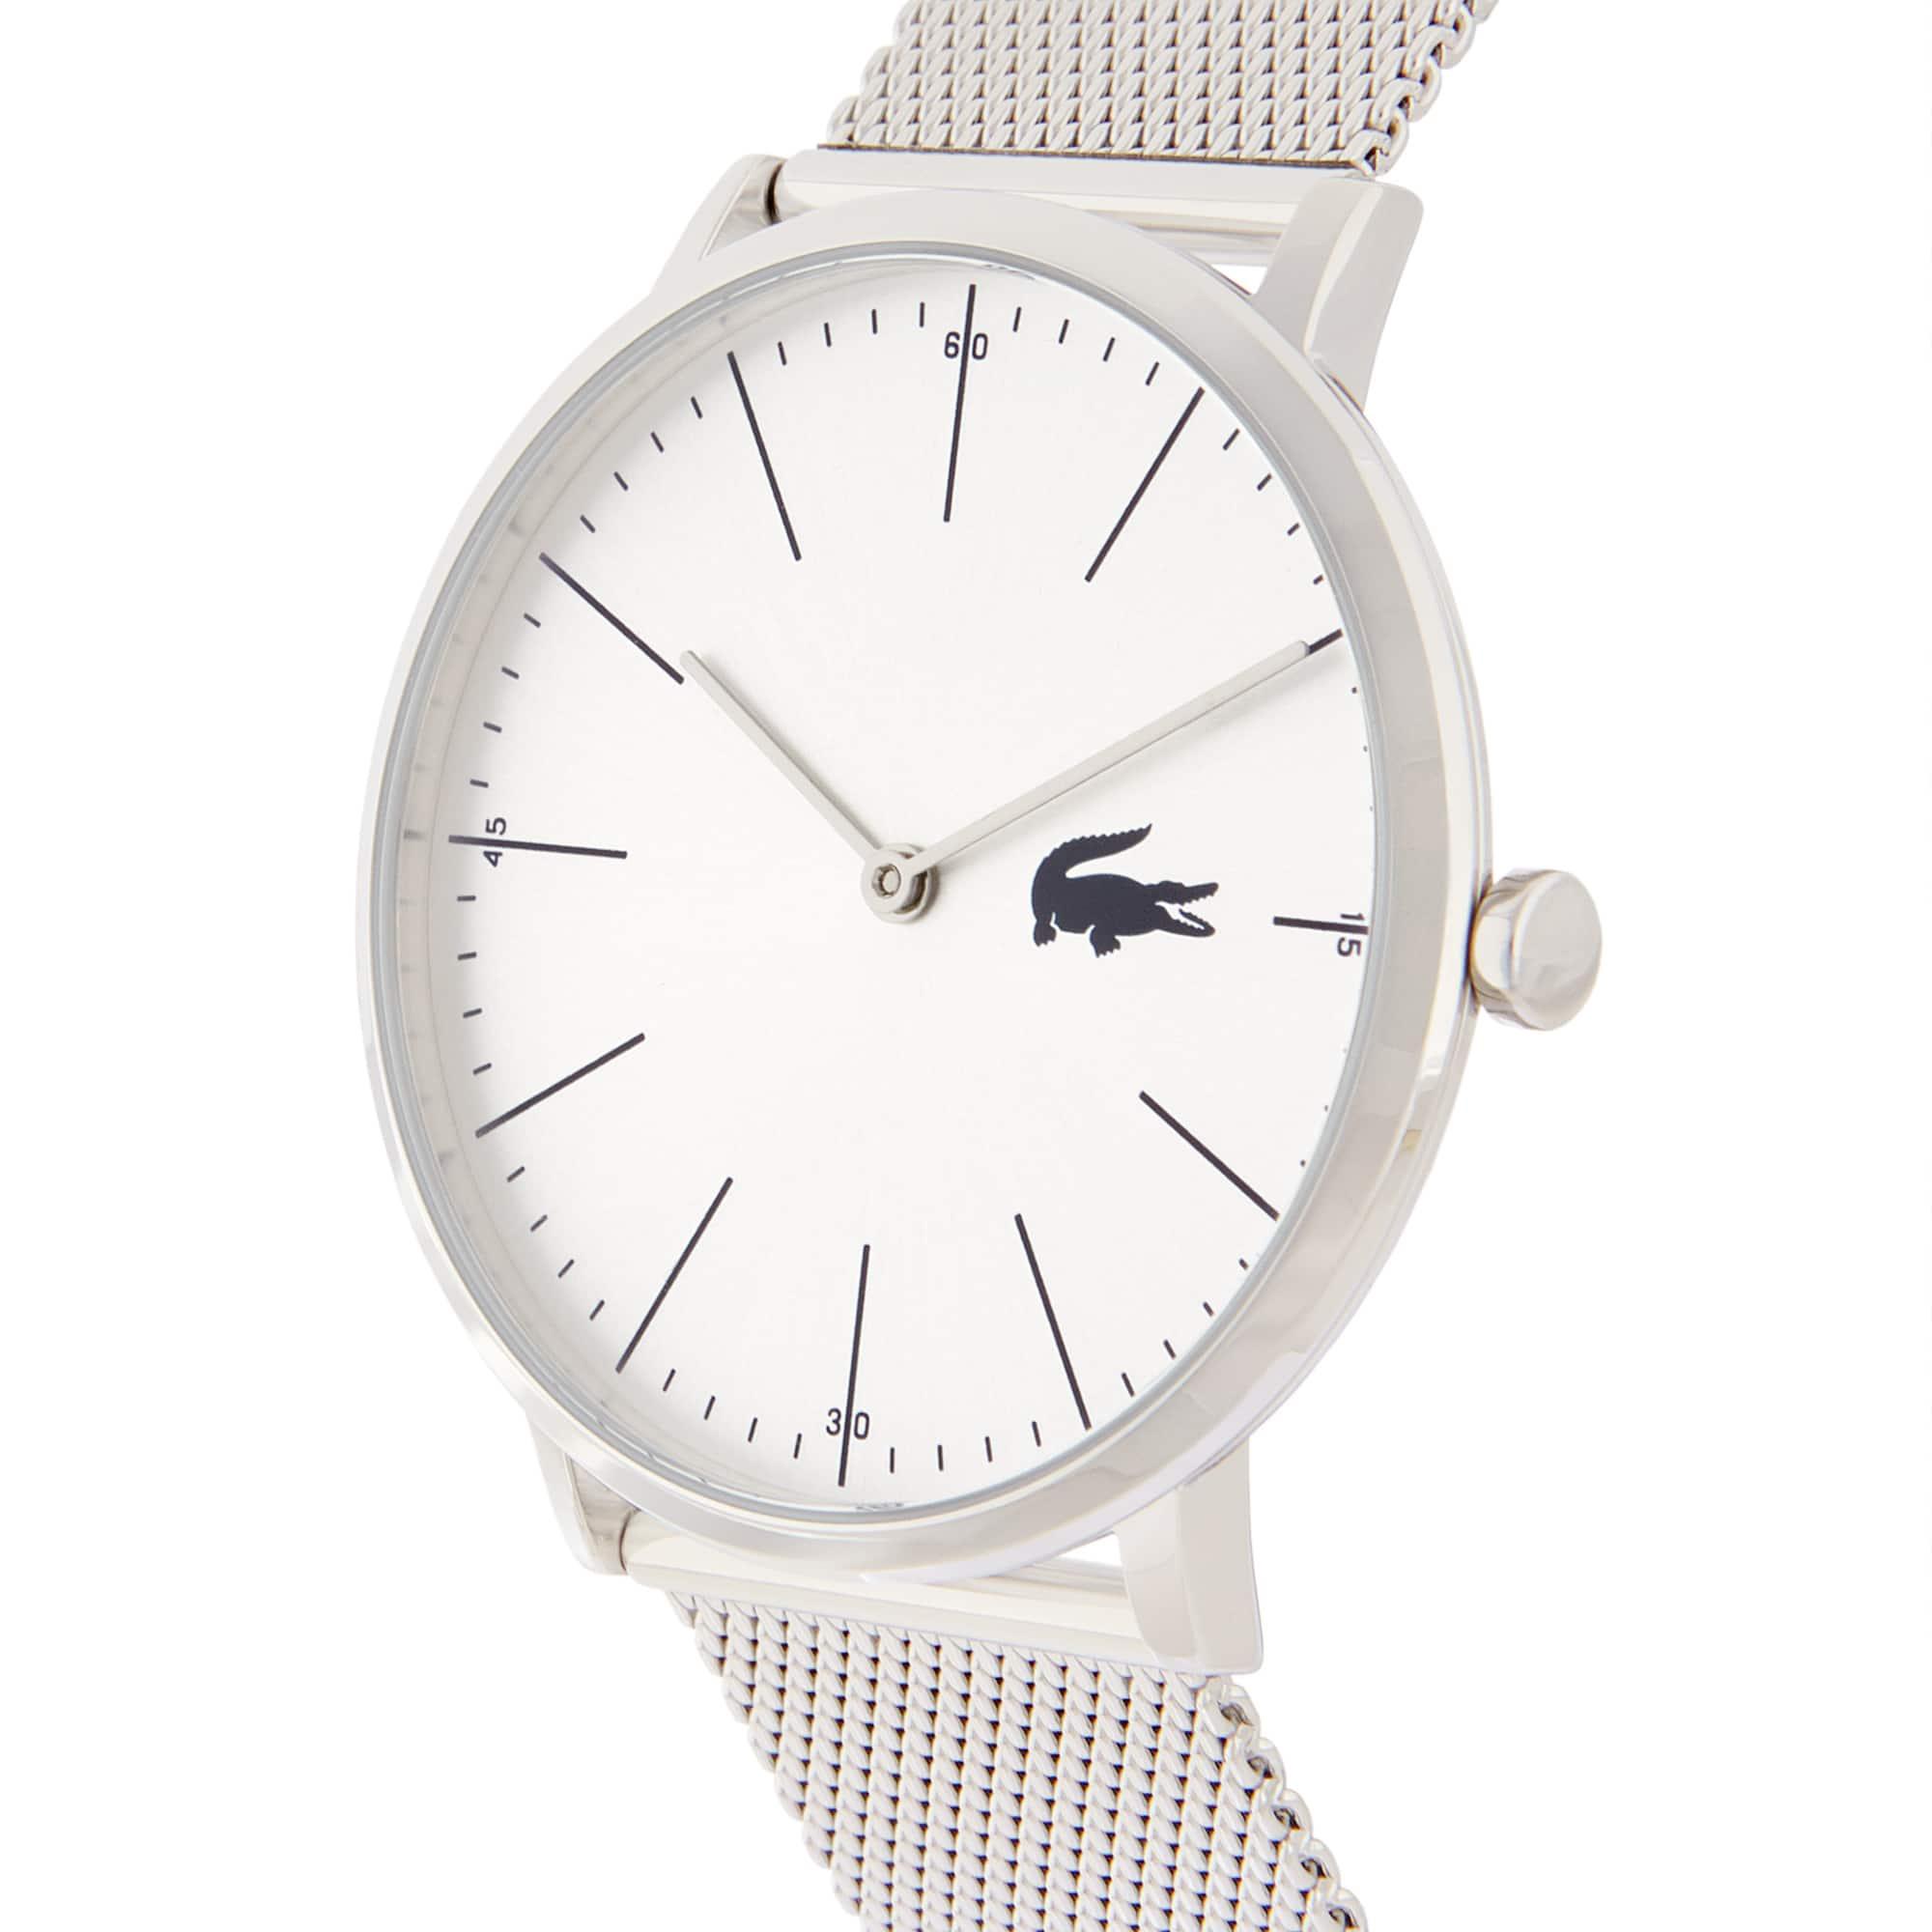 Men's Moon Ultra Slim Watch with Stainless Steel Mesh Bracelet